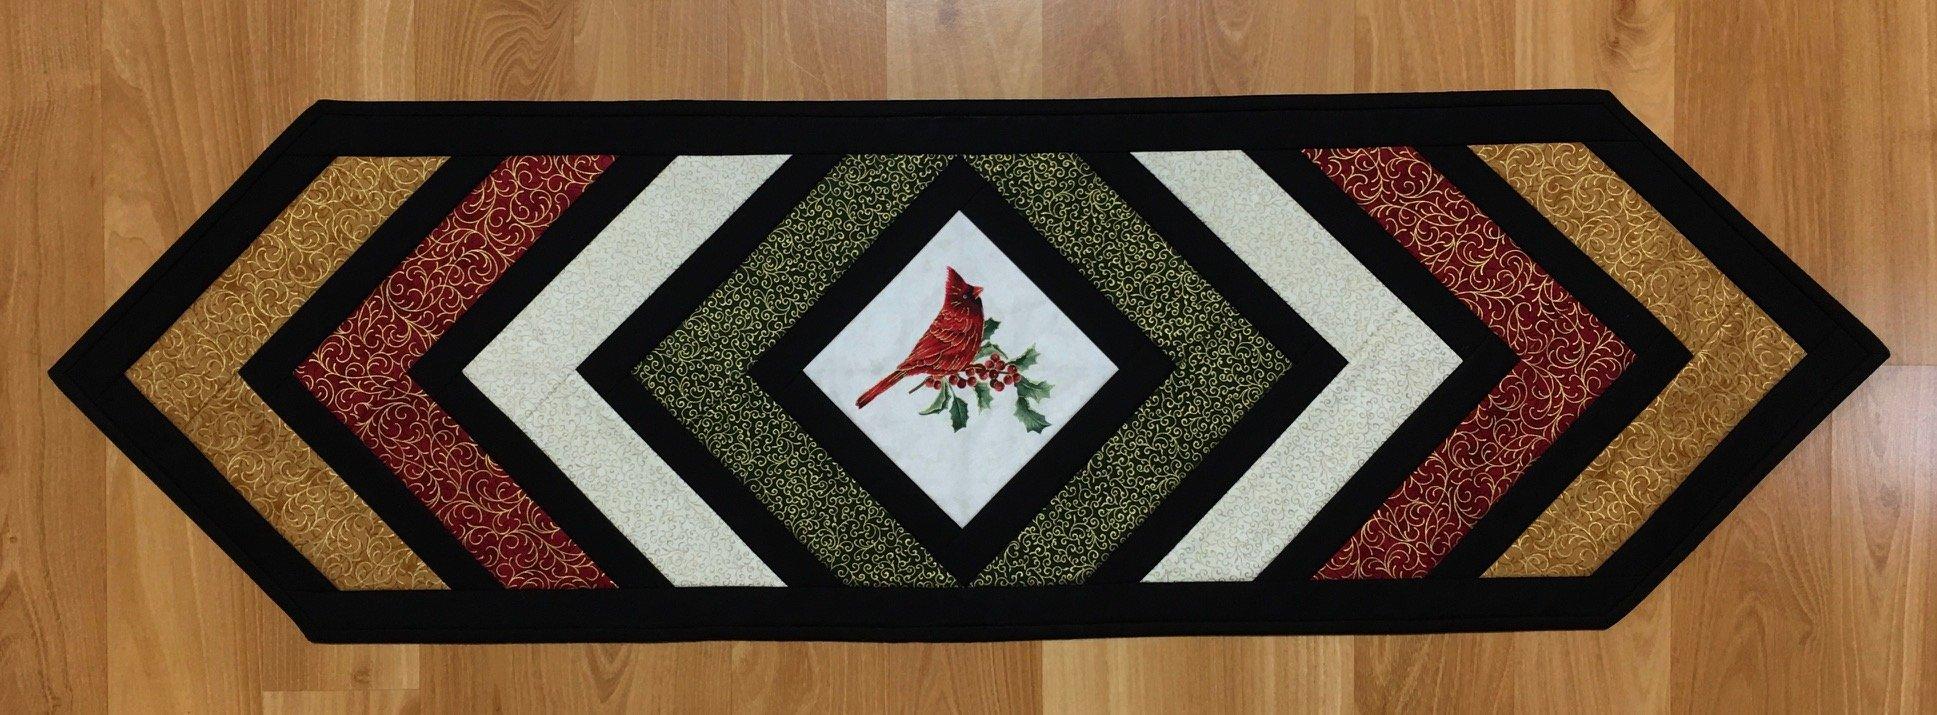 Quilt As You Go Christmas Cardinal Table Runner Kit